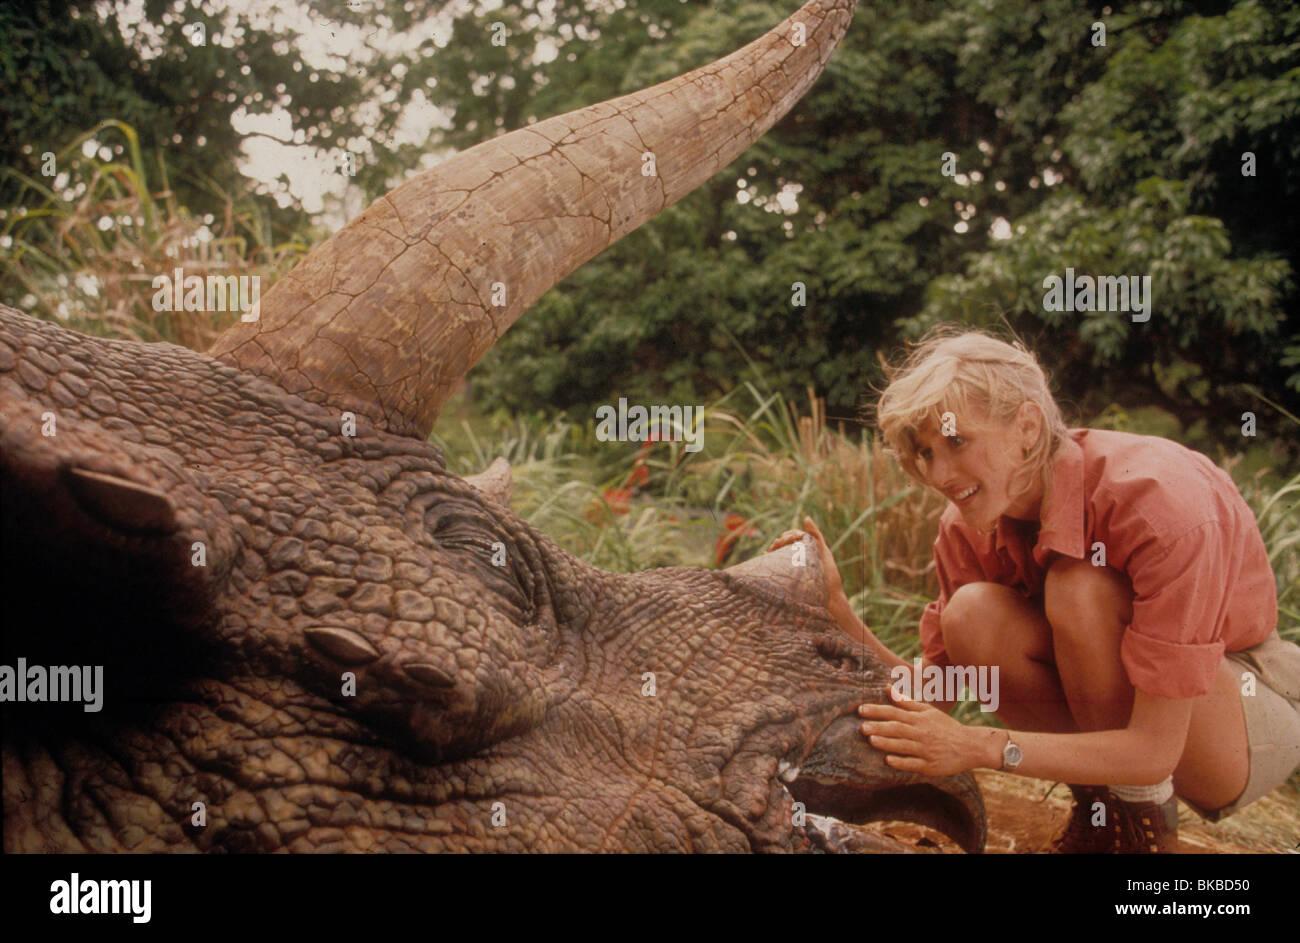 JURASSIC PARK -1993 LAURA DERN - Stock Image